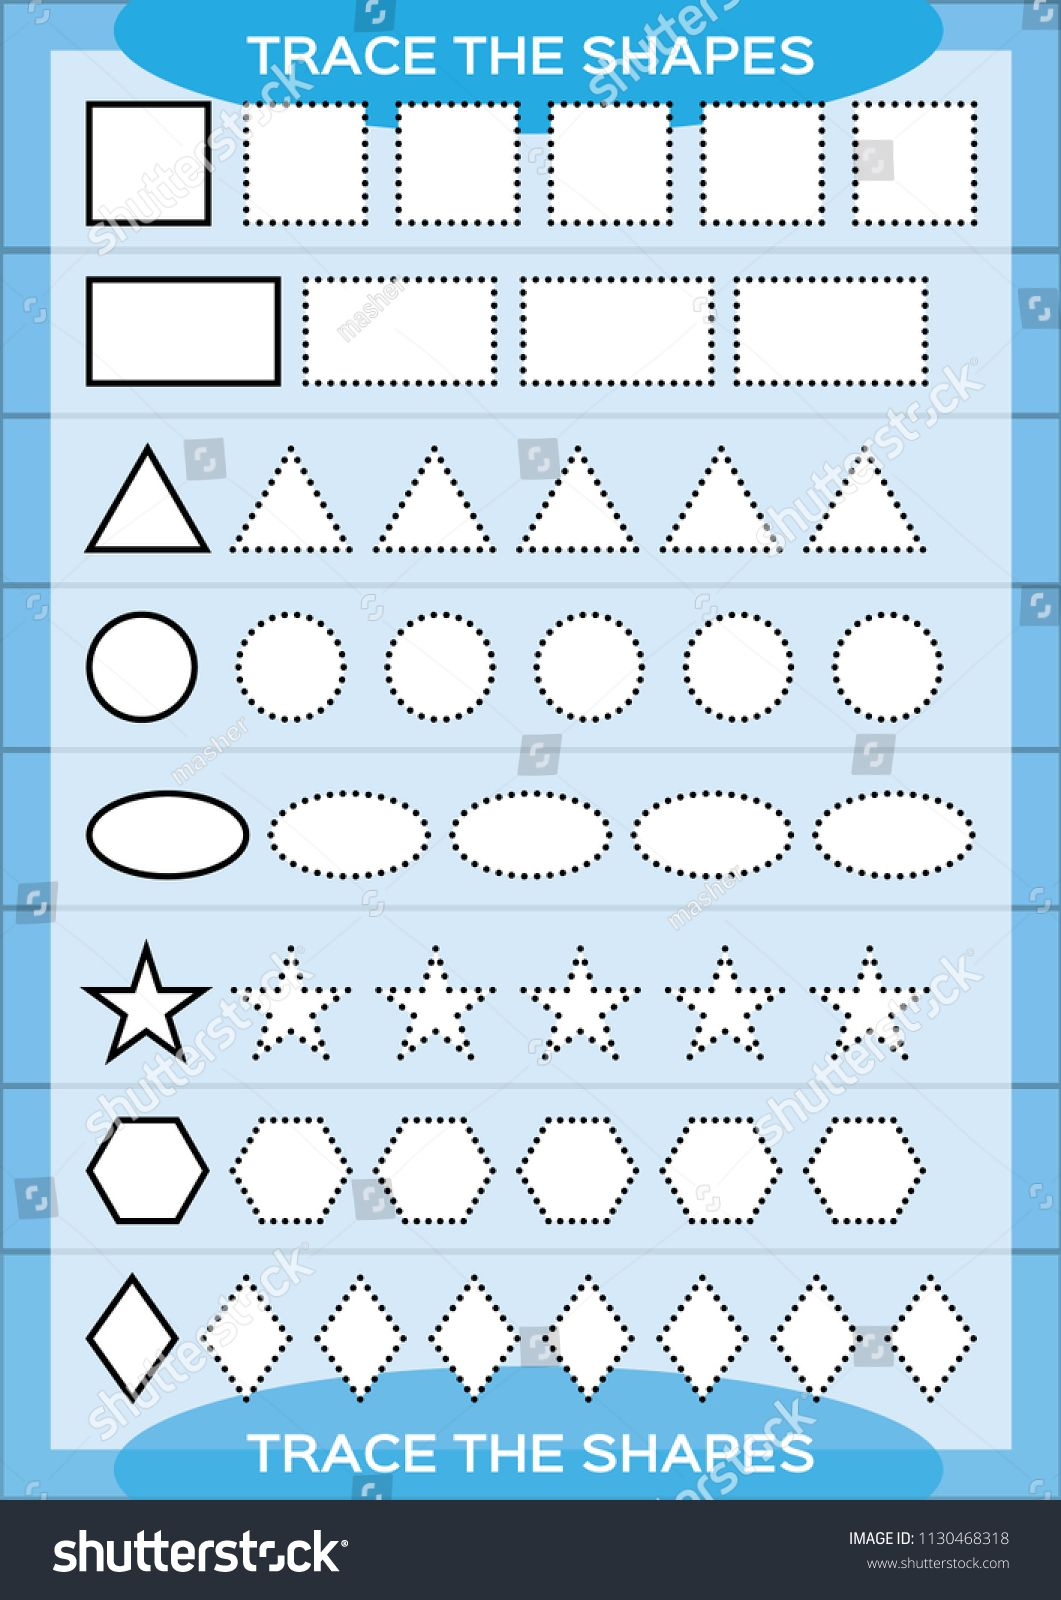 Trace The Shapes Kids Education Preschool Worksheet Basic Writing Kids Doing Worksheets Tracing Worksheets Preschool Preschool Worksheets Shapes Worksheets [ 1600 x 1061 Pixel ]